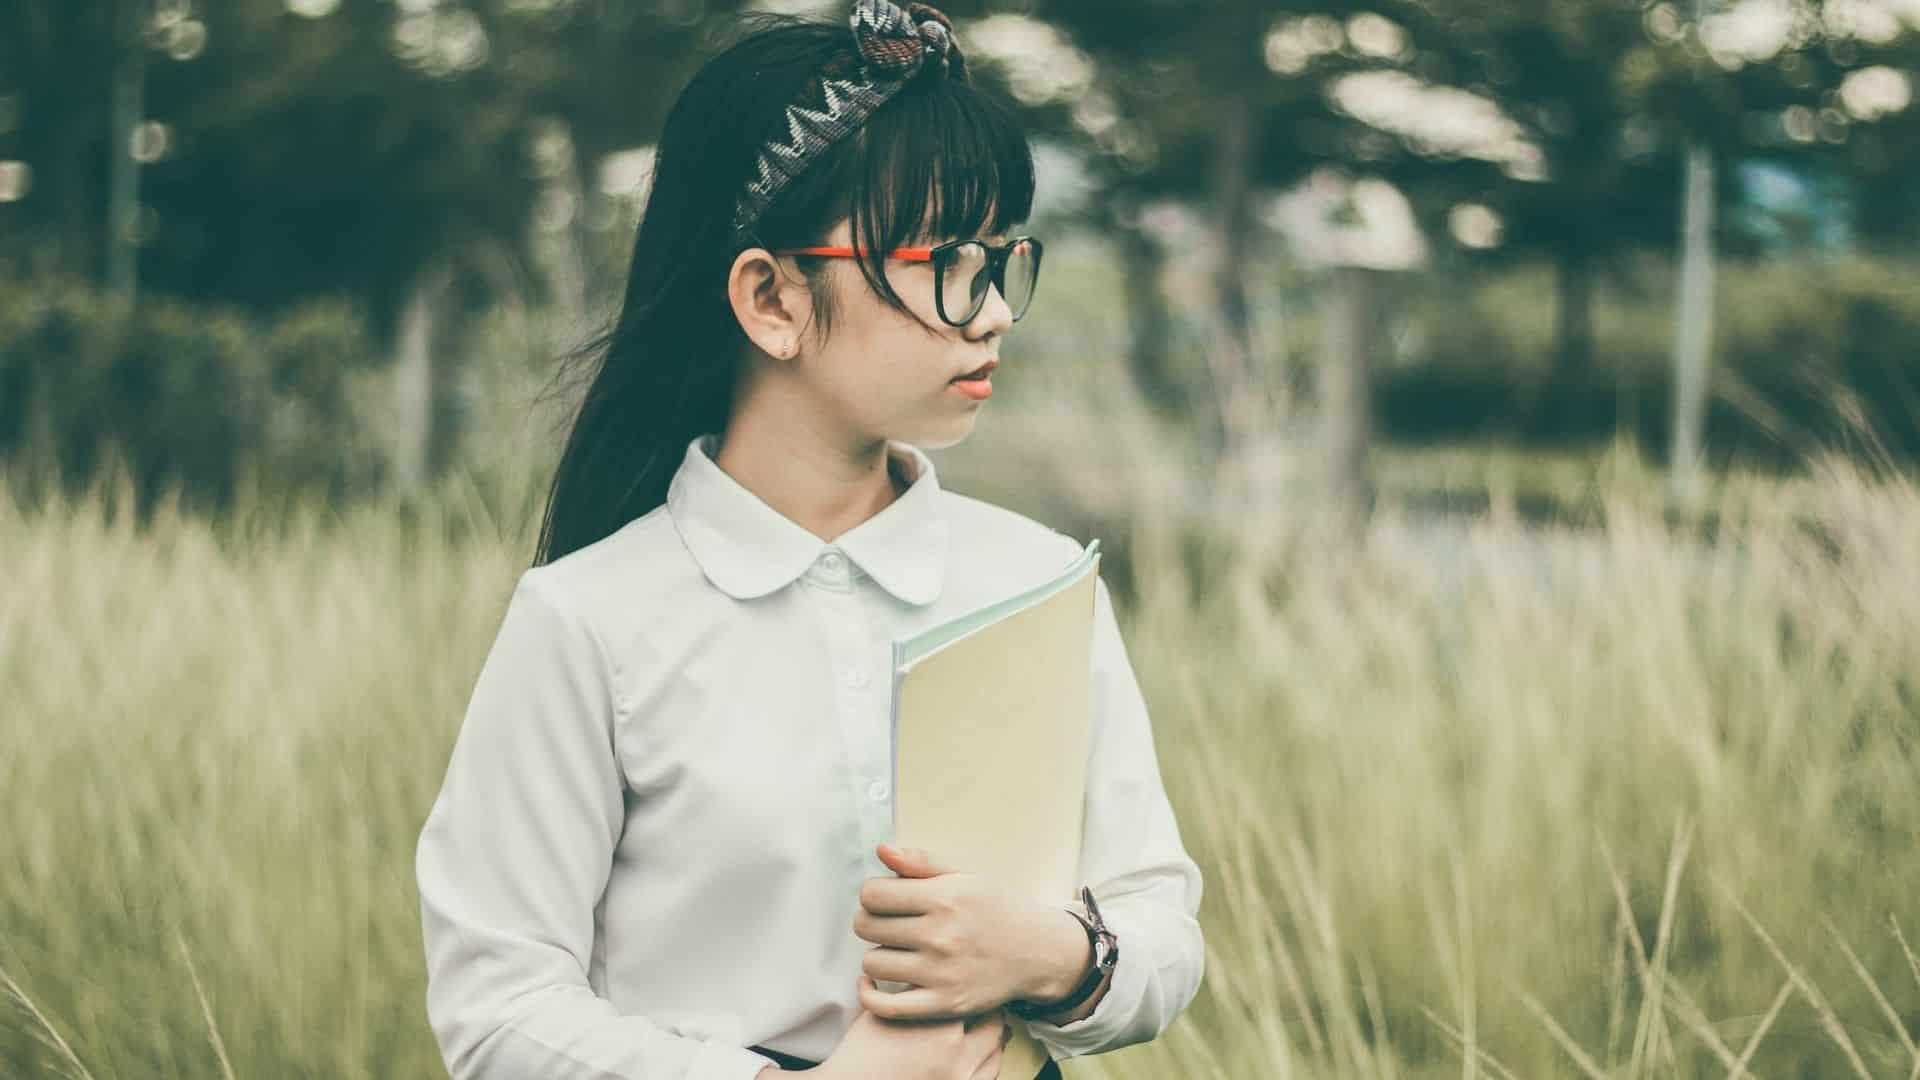 Asian school children student